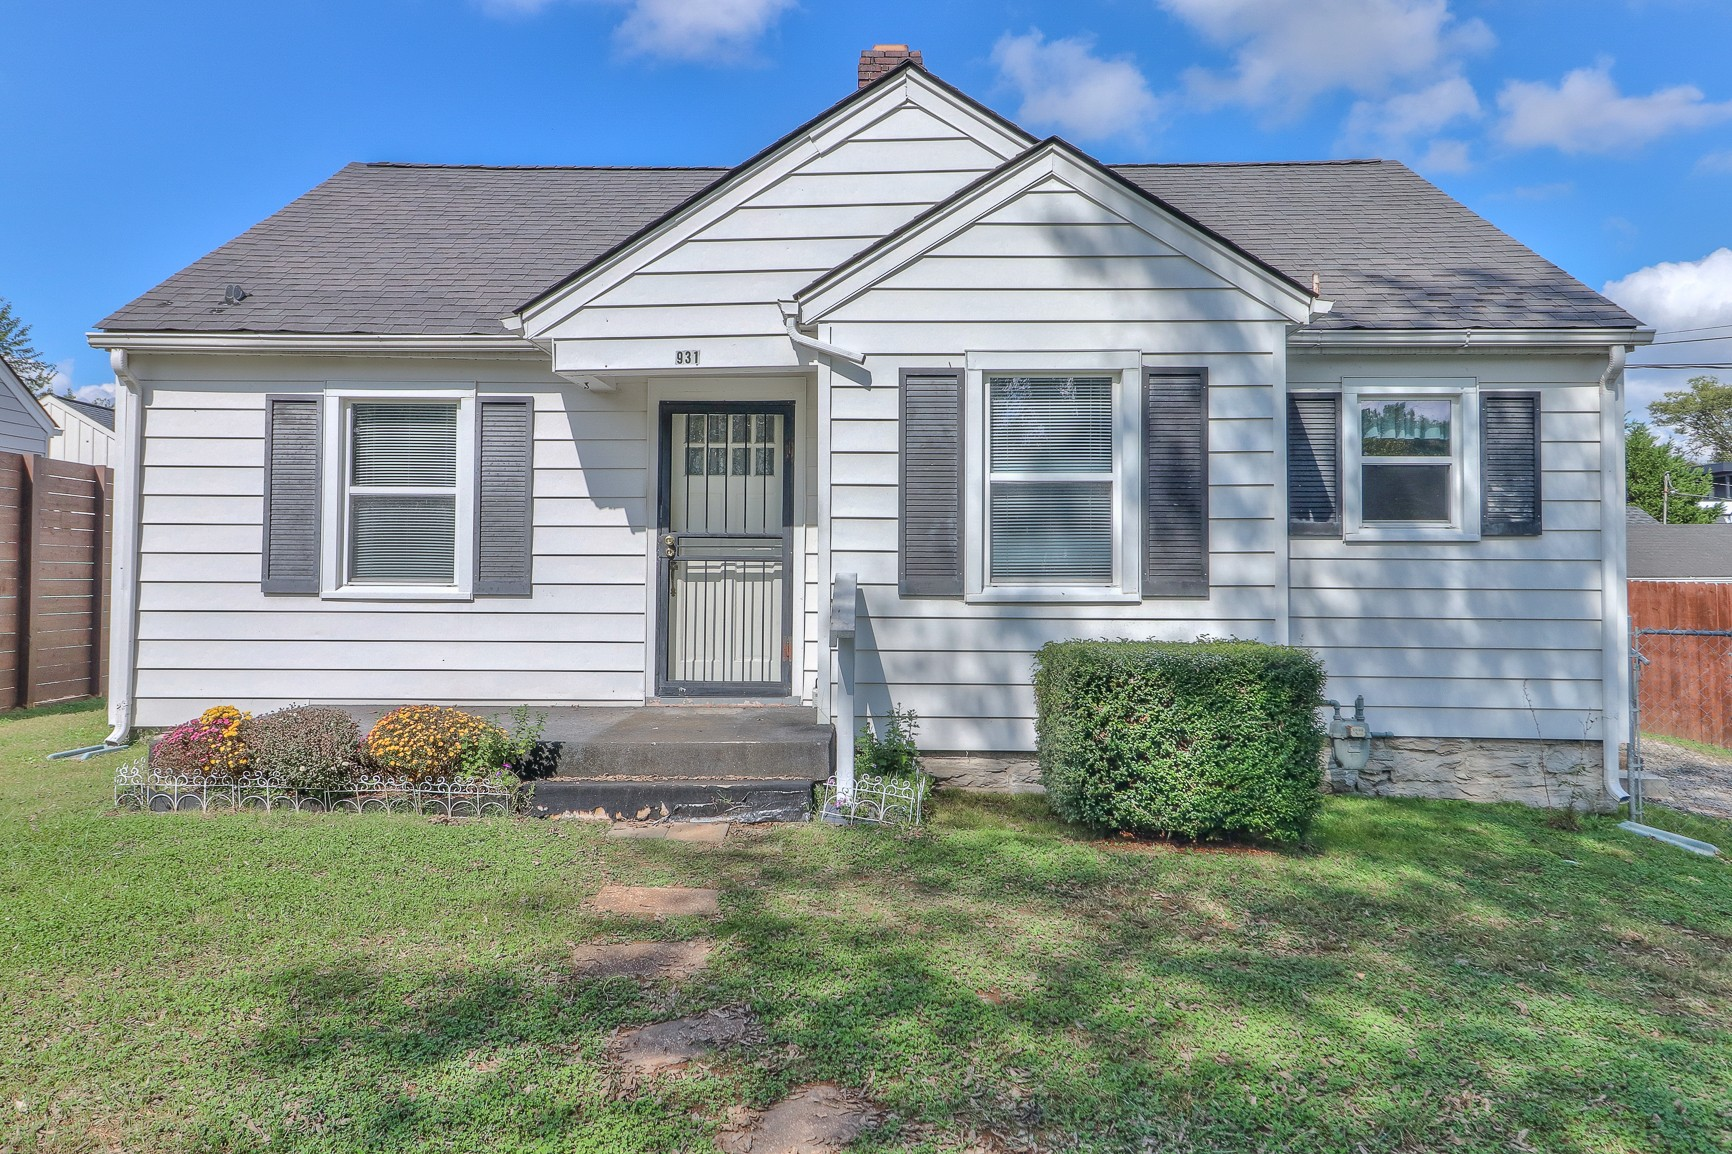 931 Granada Ave Property Photo 1